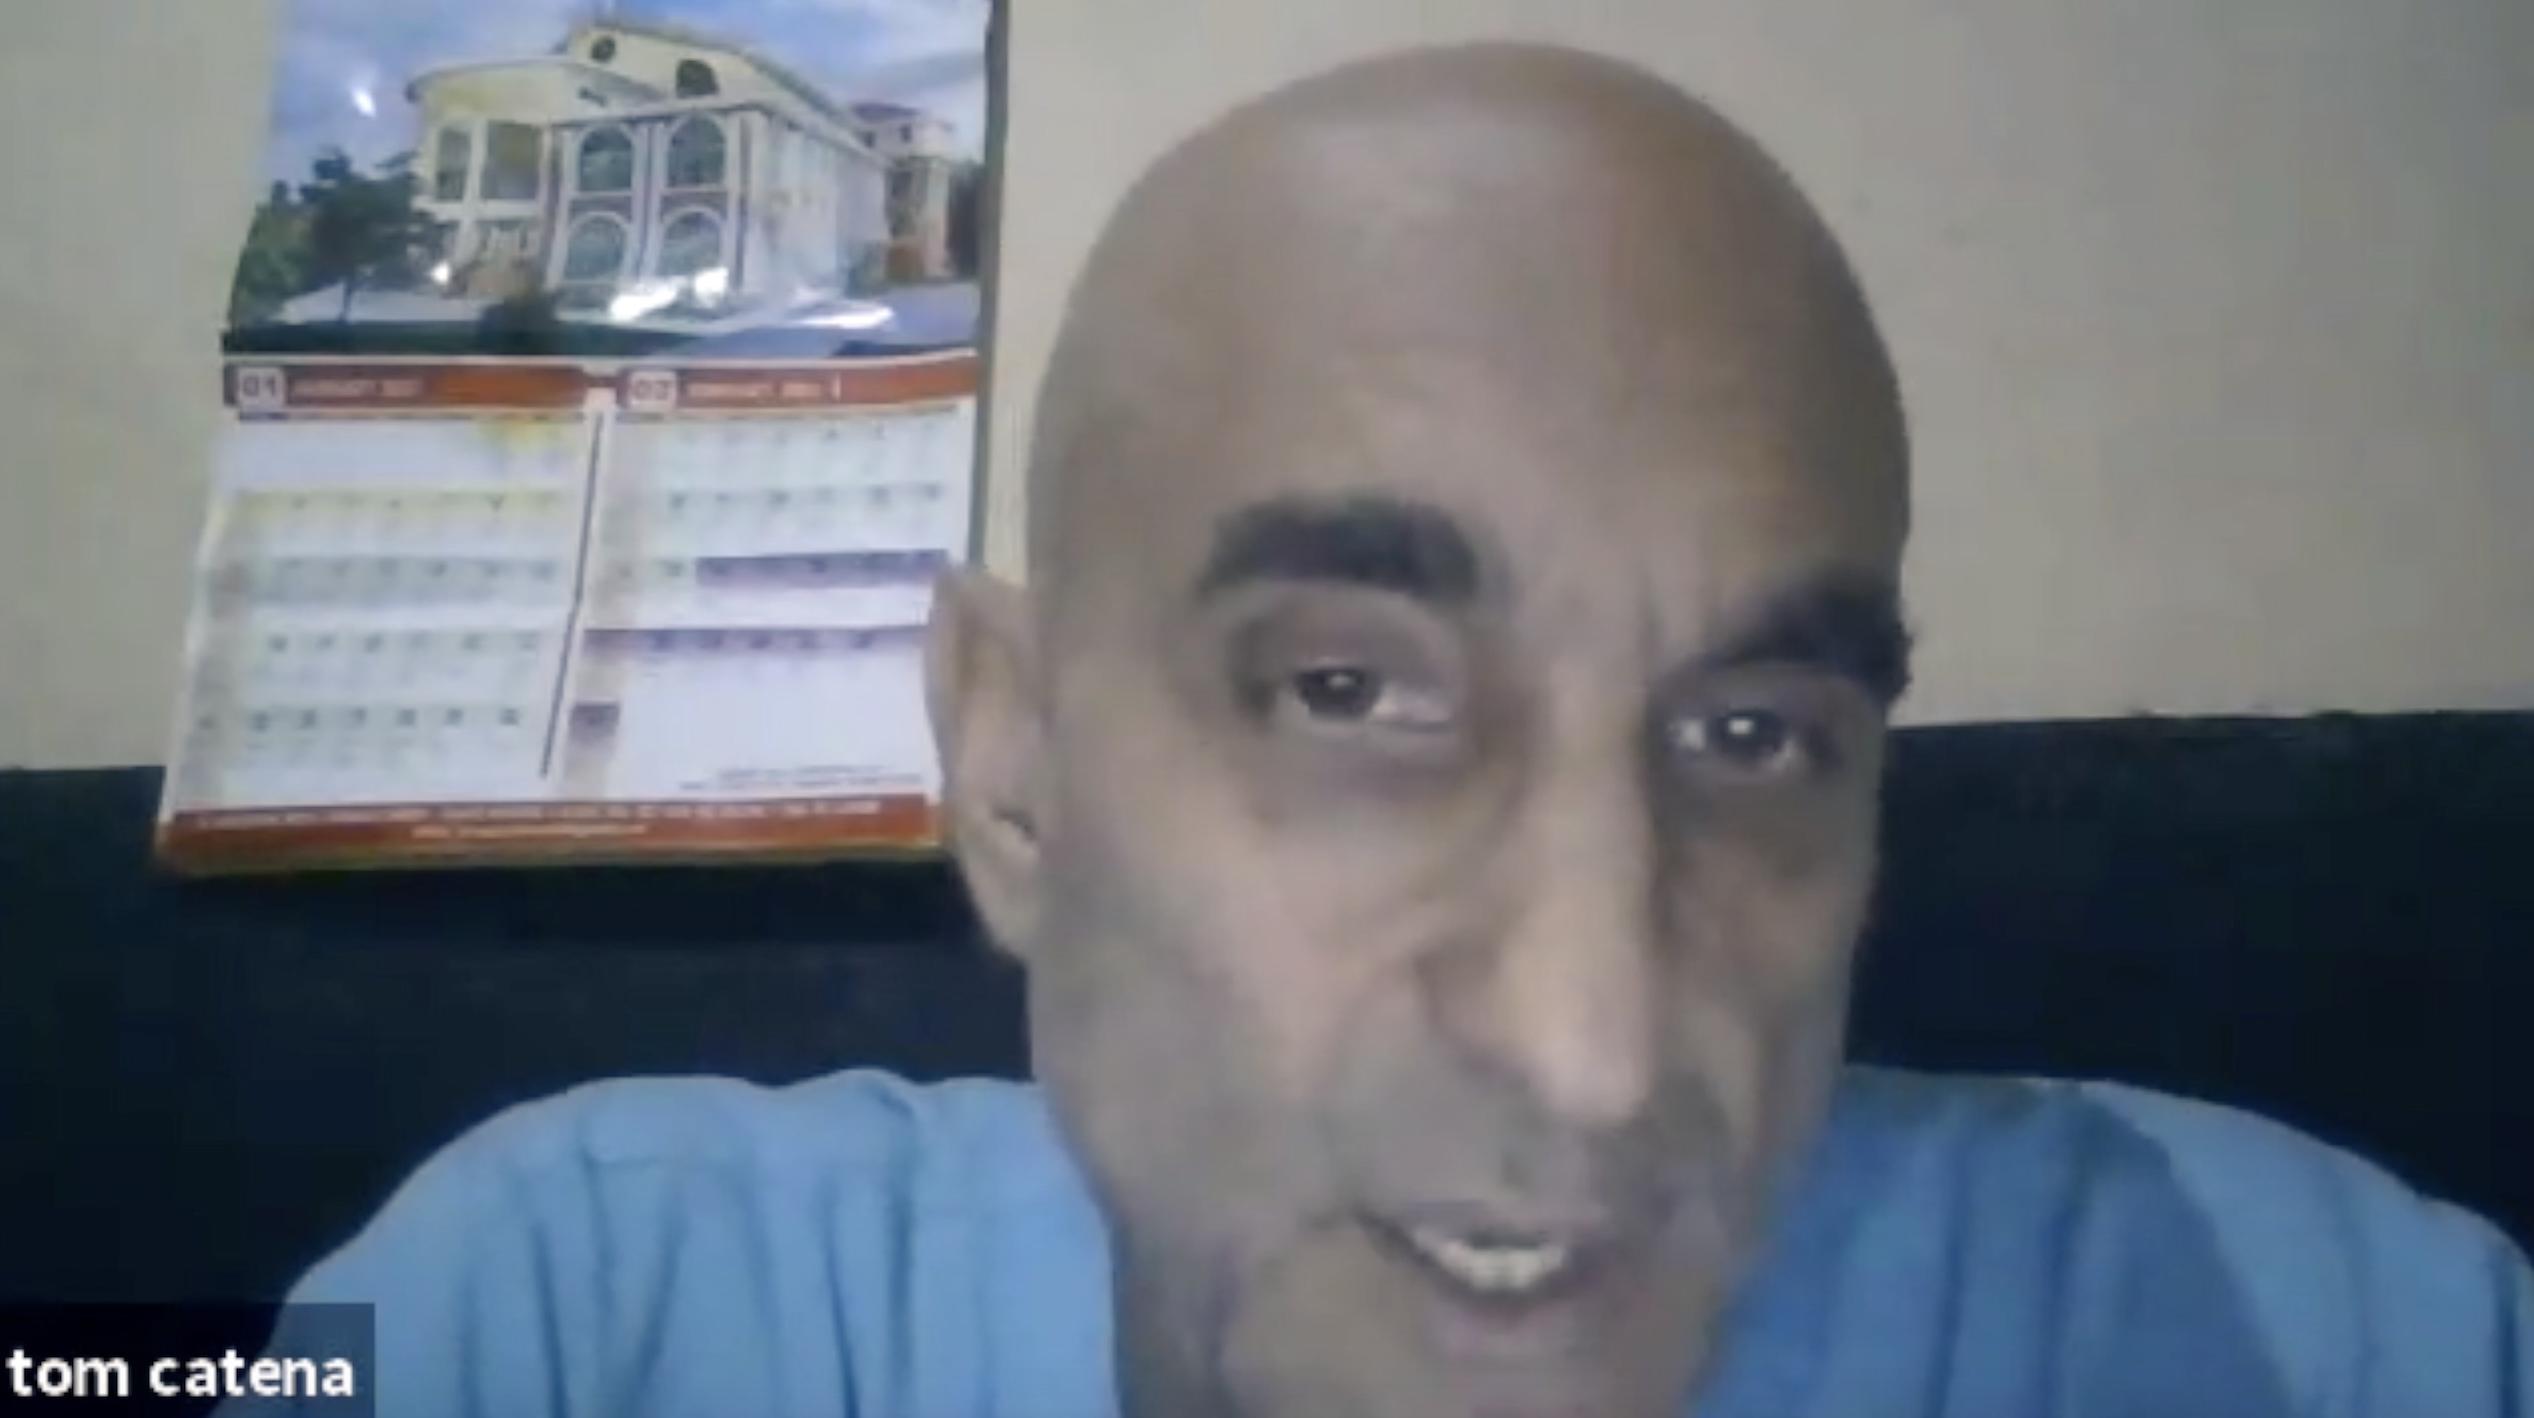 Dr. Tom Catena un a video call